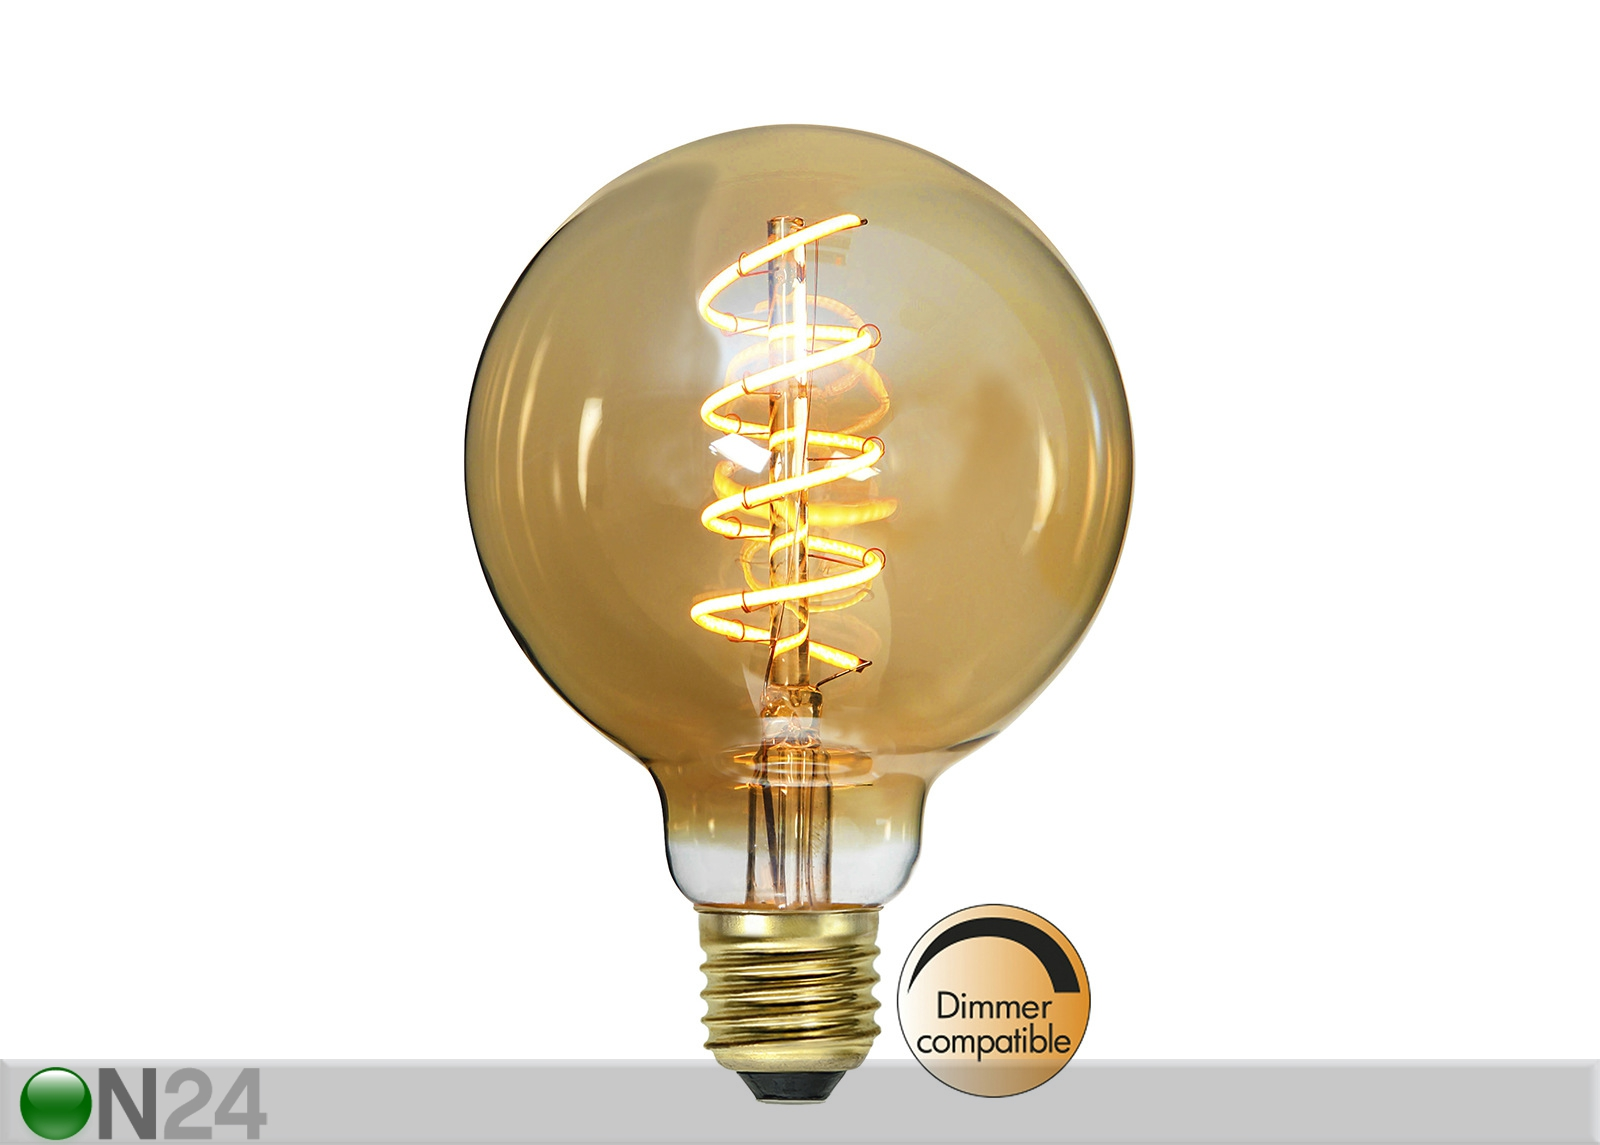 c9d72a0cb74 Dekoratiivne LED pirn E27 3 W AA-142525 - ON24 Sisustuskaubamaja